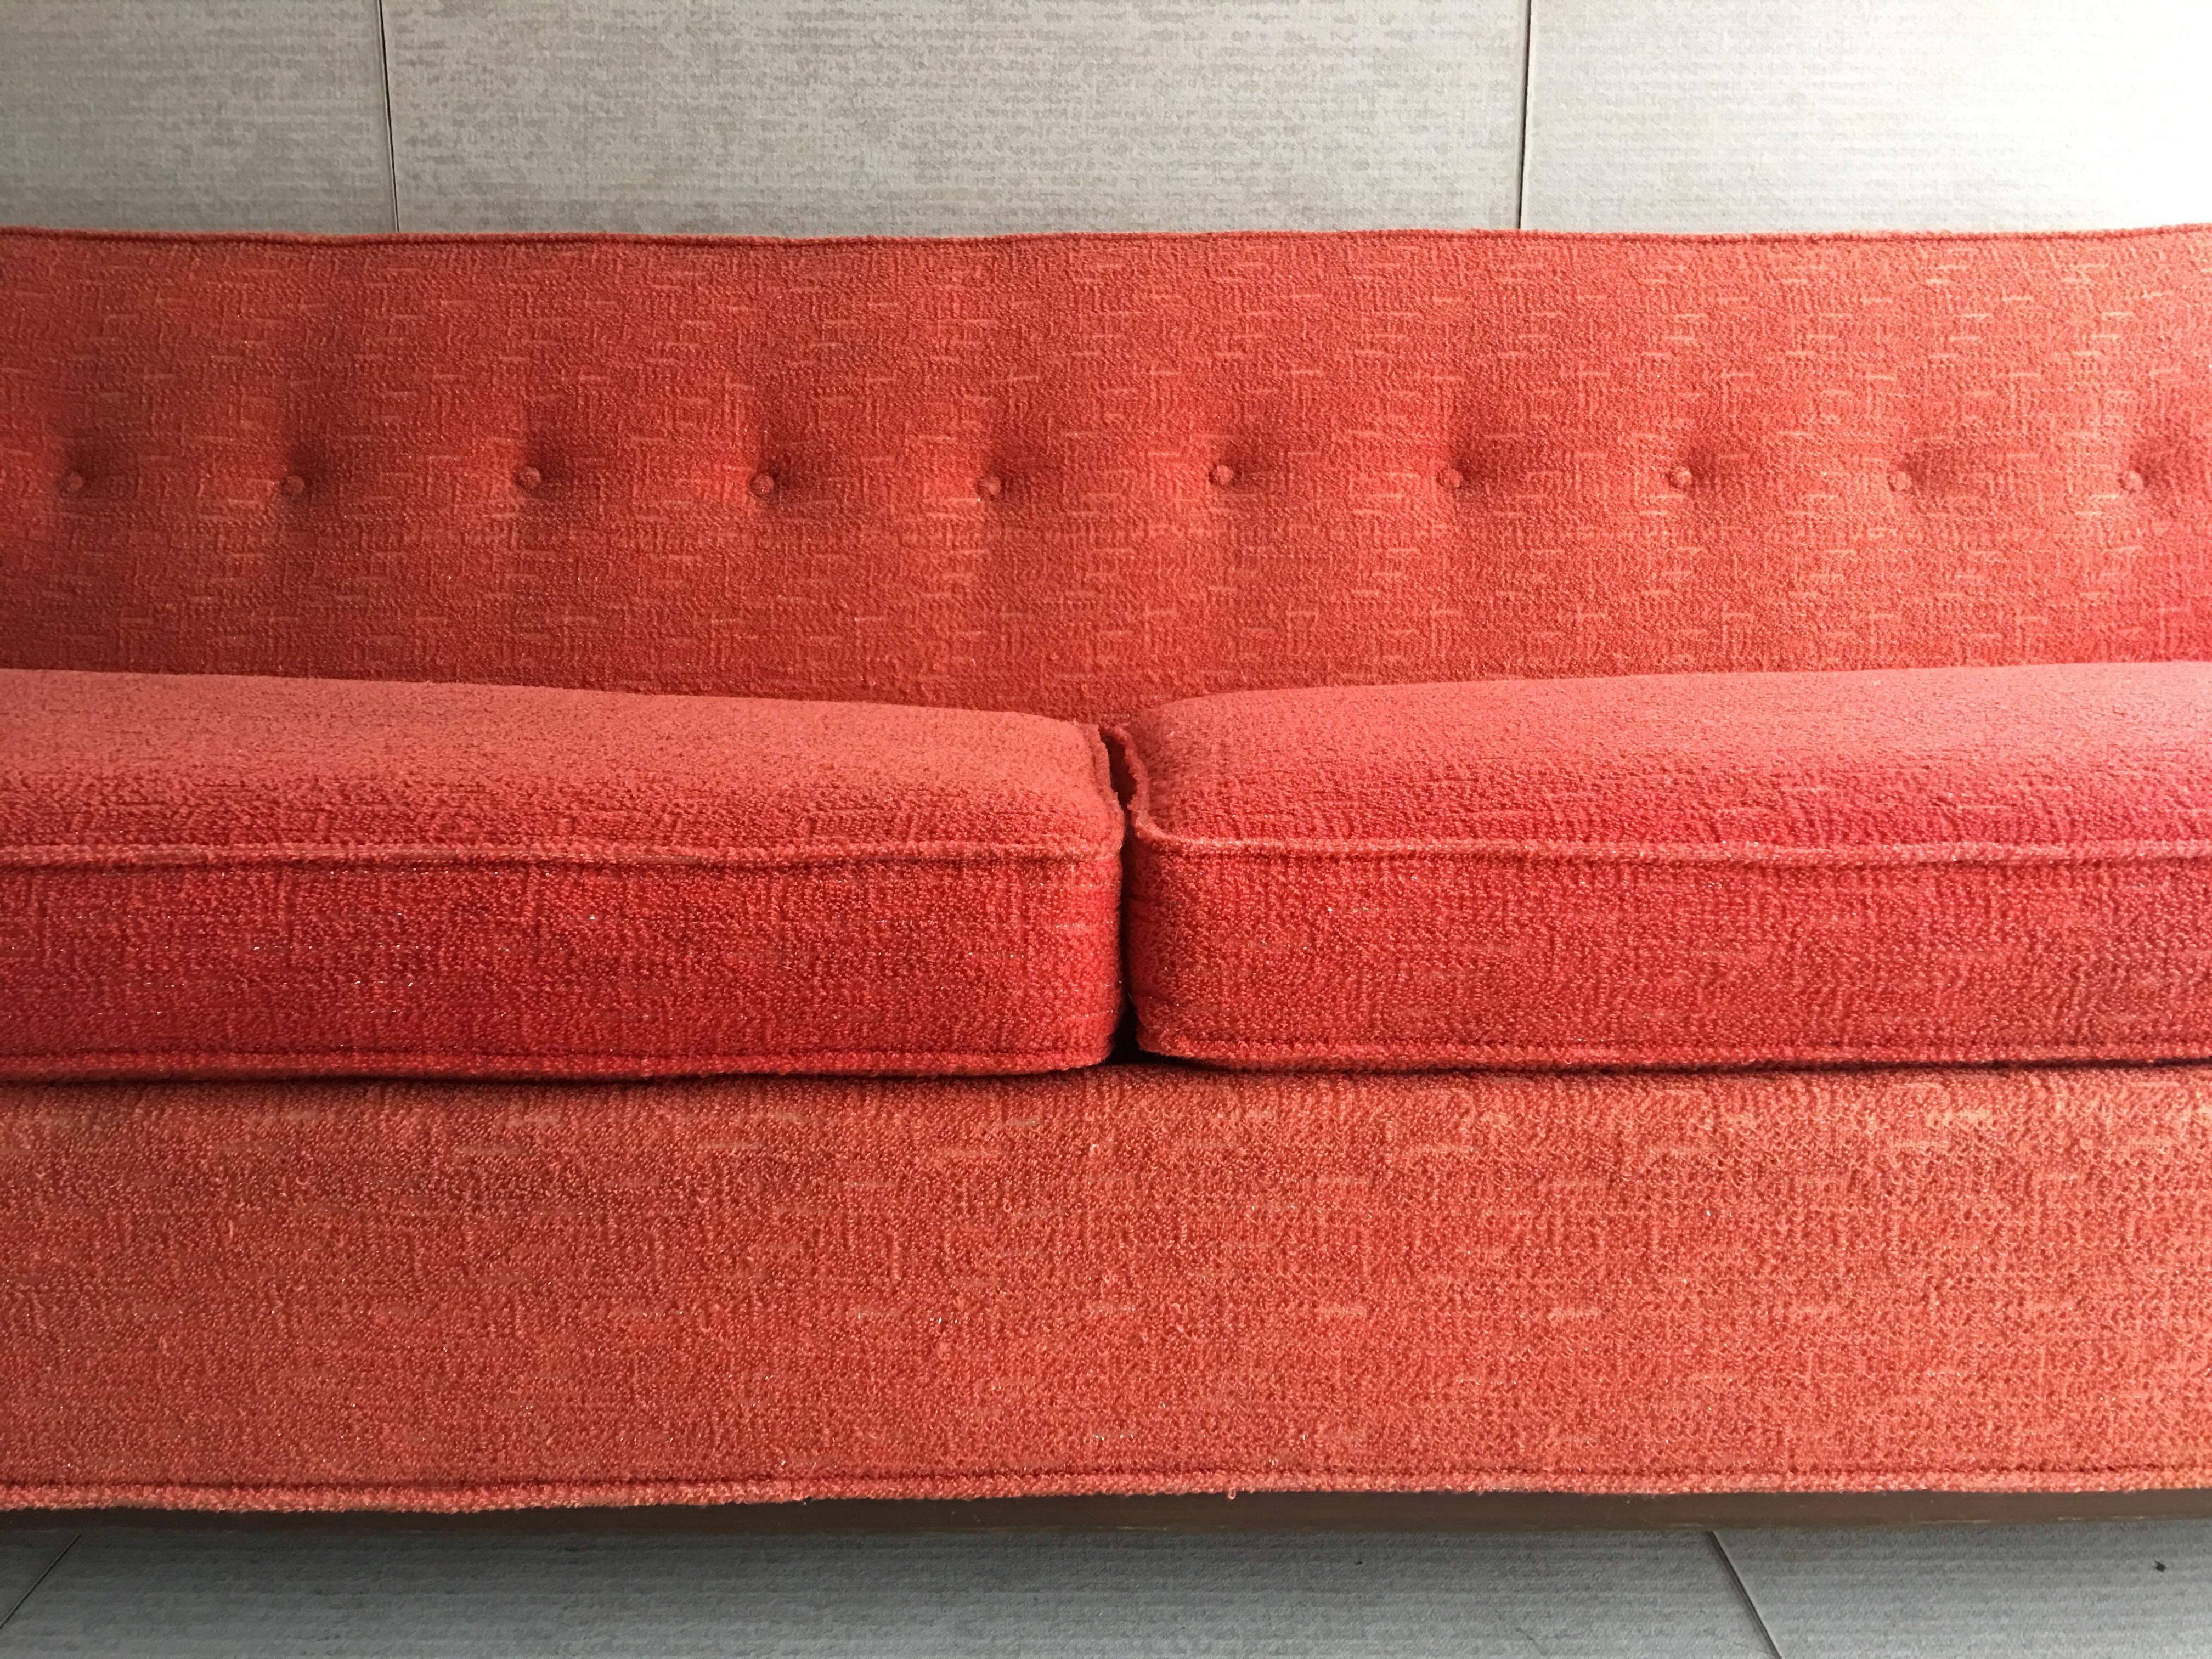 Kroehler Sofa Vintage